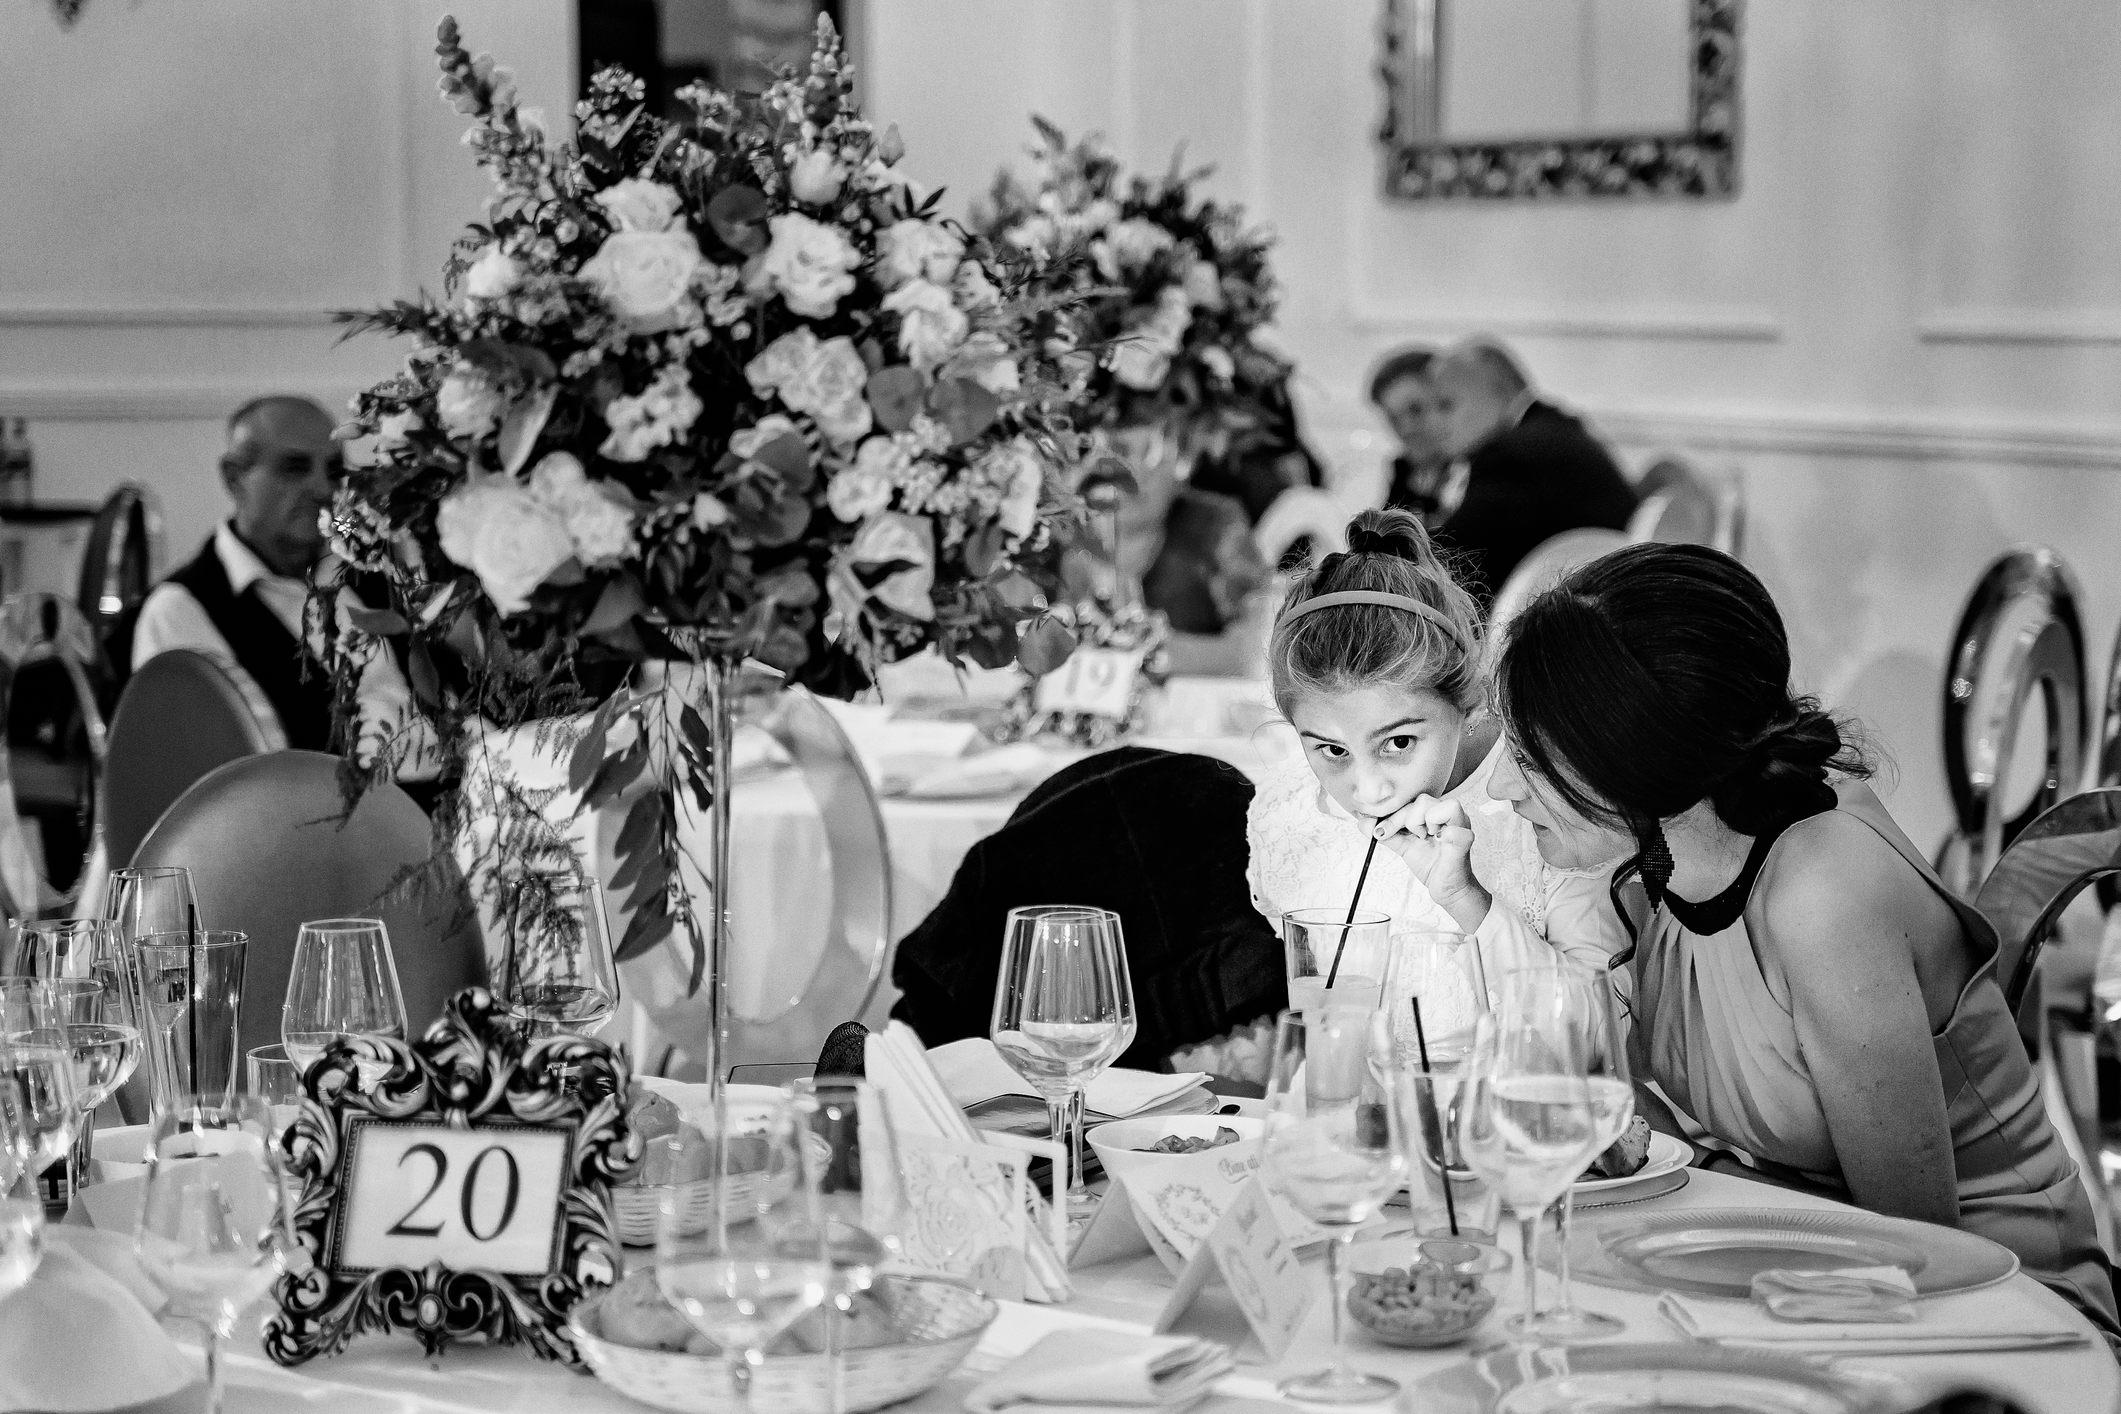 fotograf nunta bucuresti laurentiu nica  29 - Lorena & Matei | Fotografii nunta Bucuresti | Restaurant Domeniul cu Ciresi